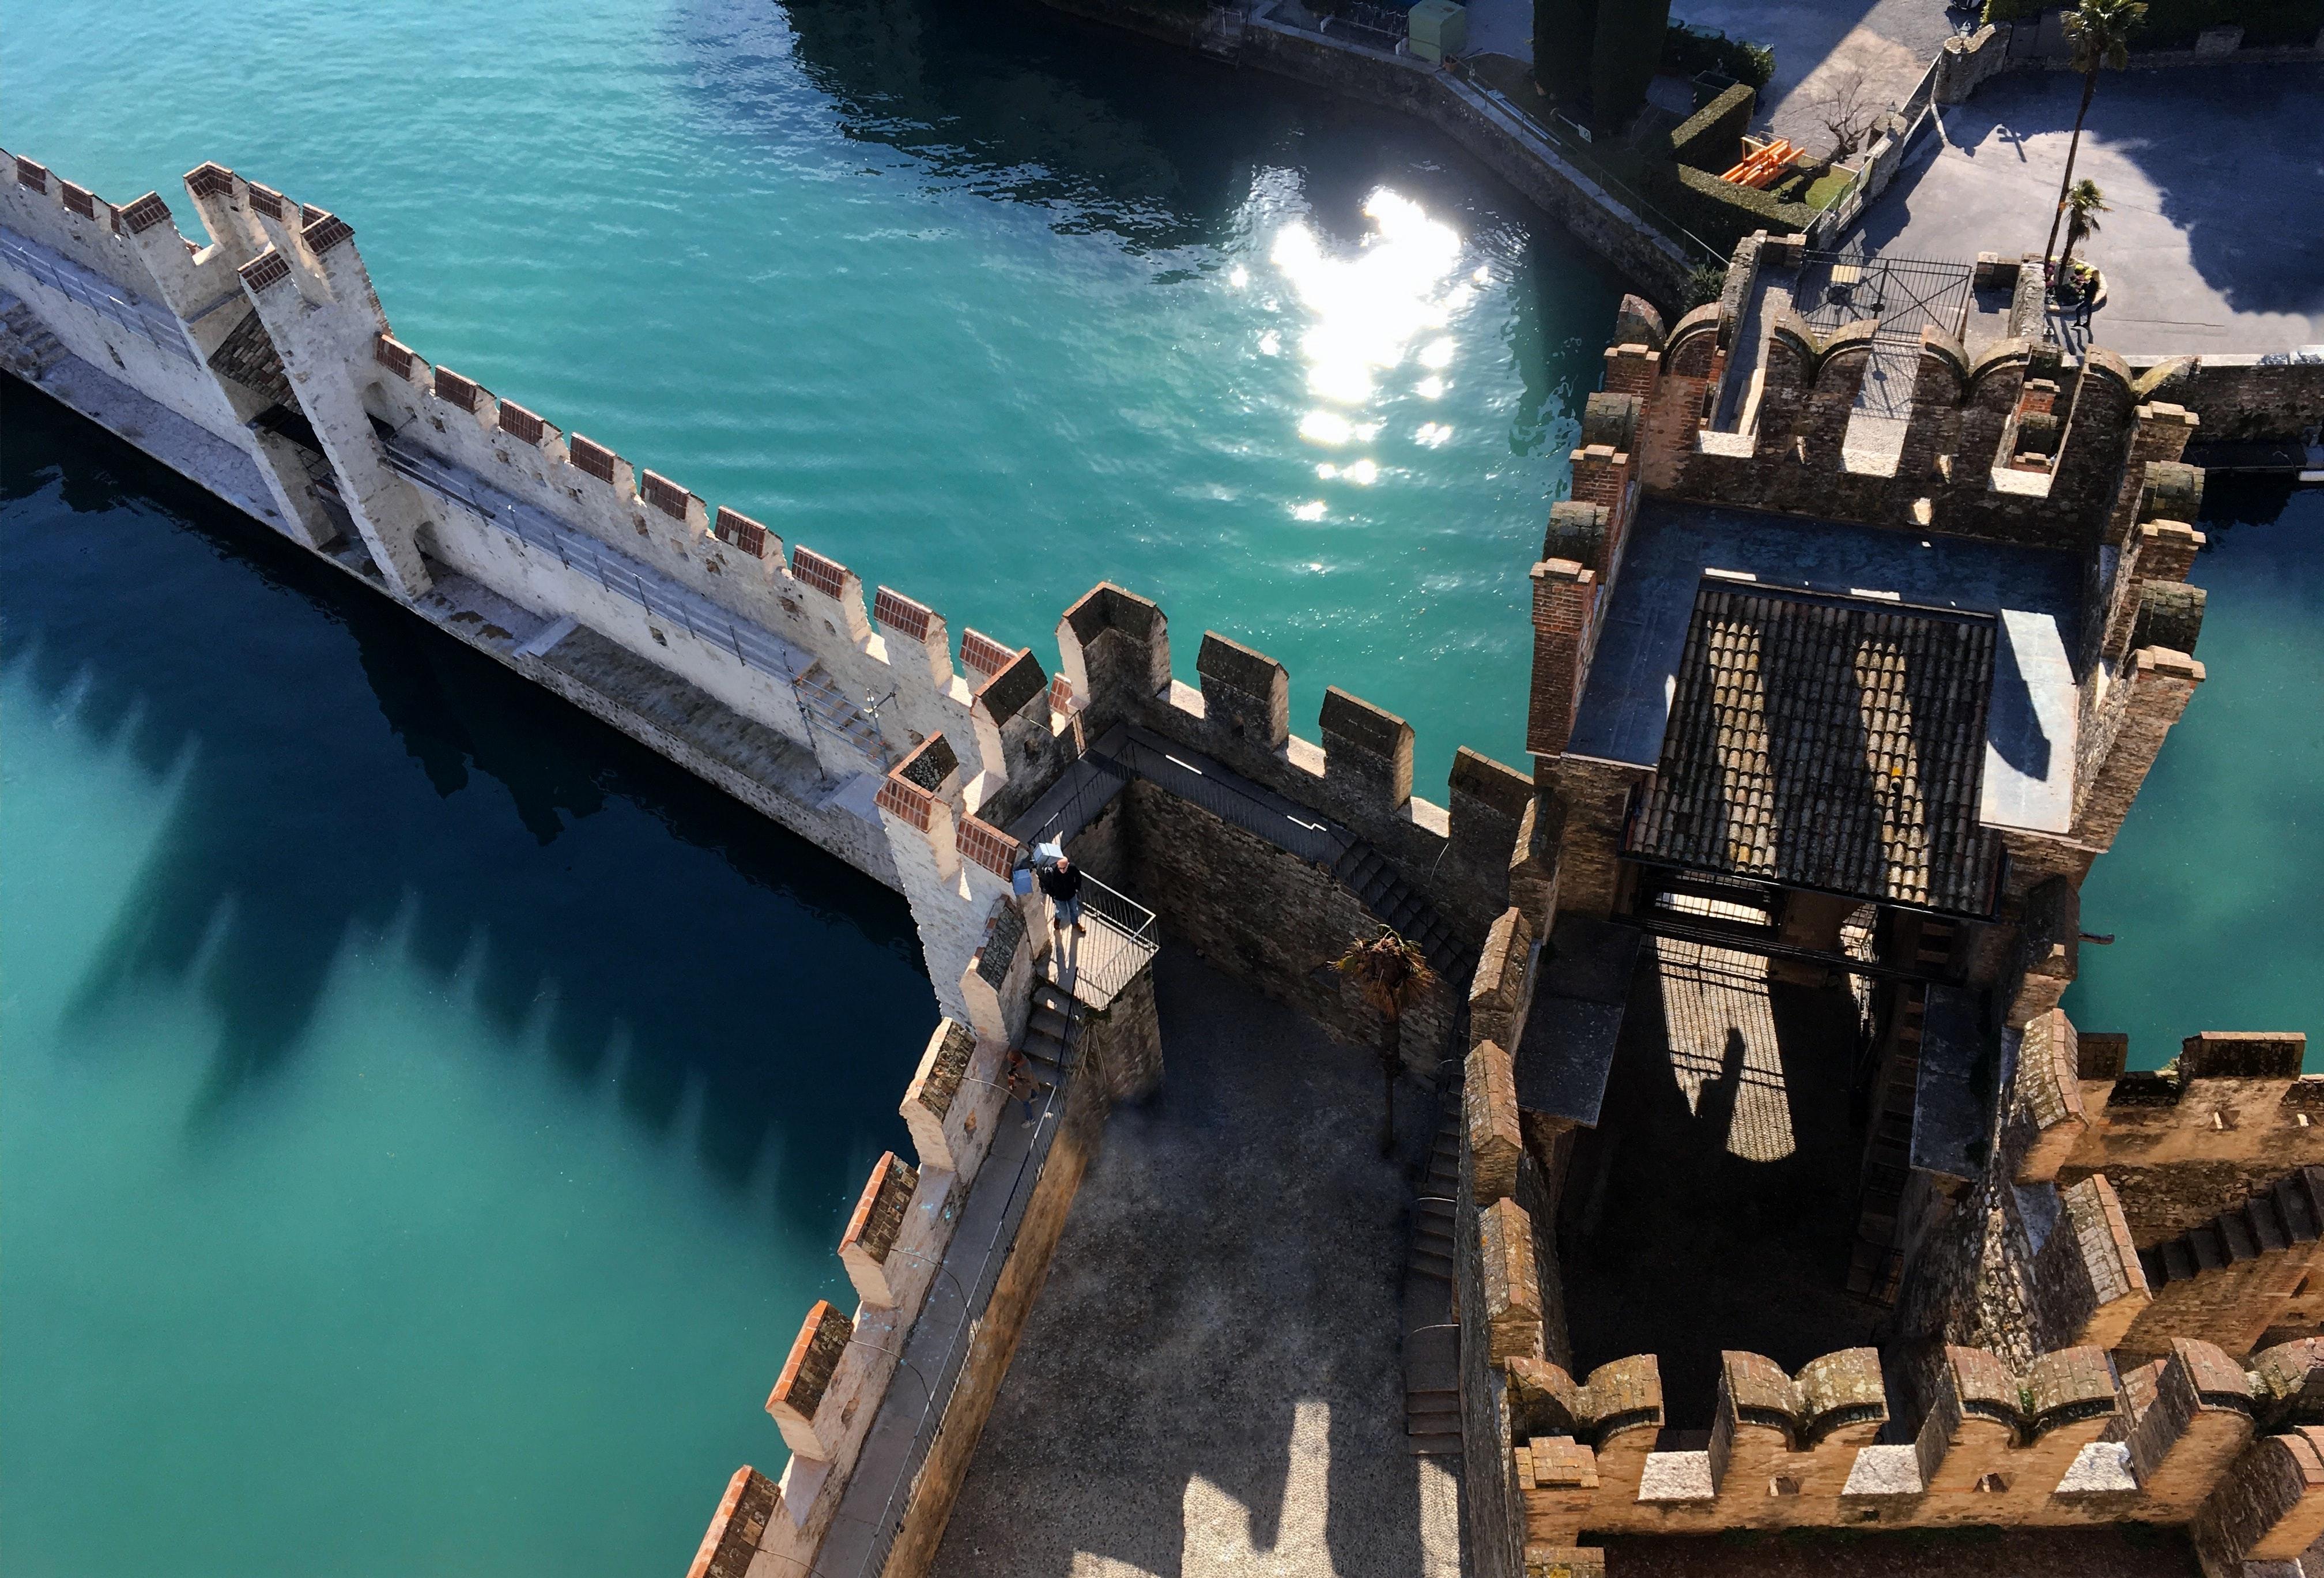 15 Best Things To Do in Lake Garda, Italy